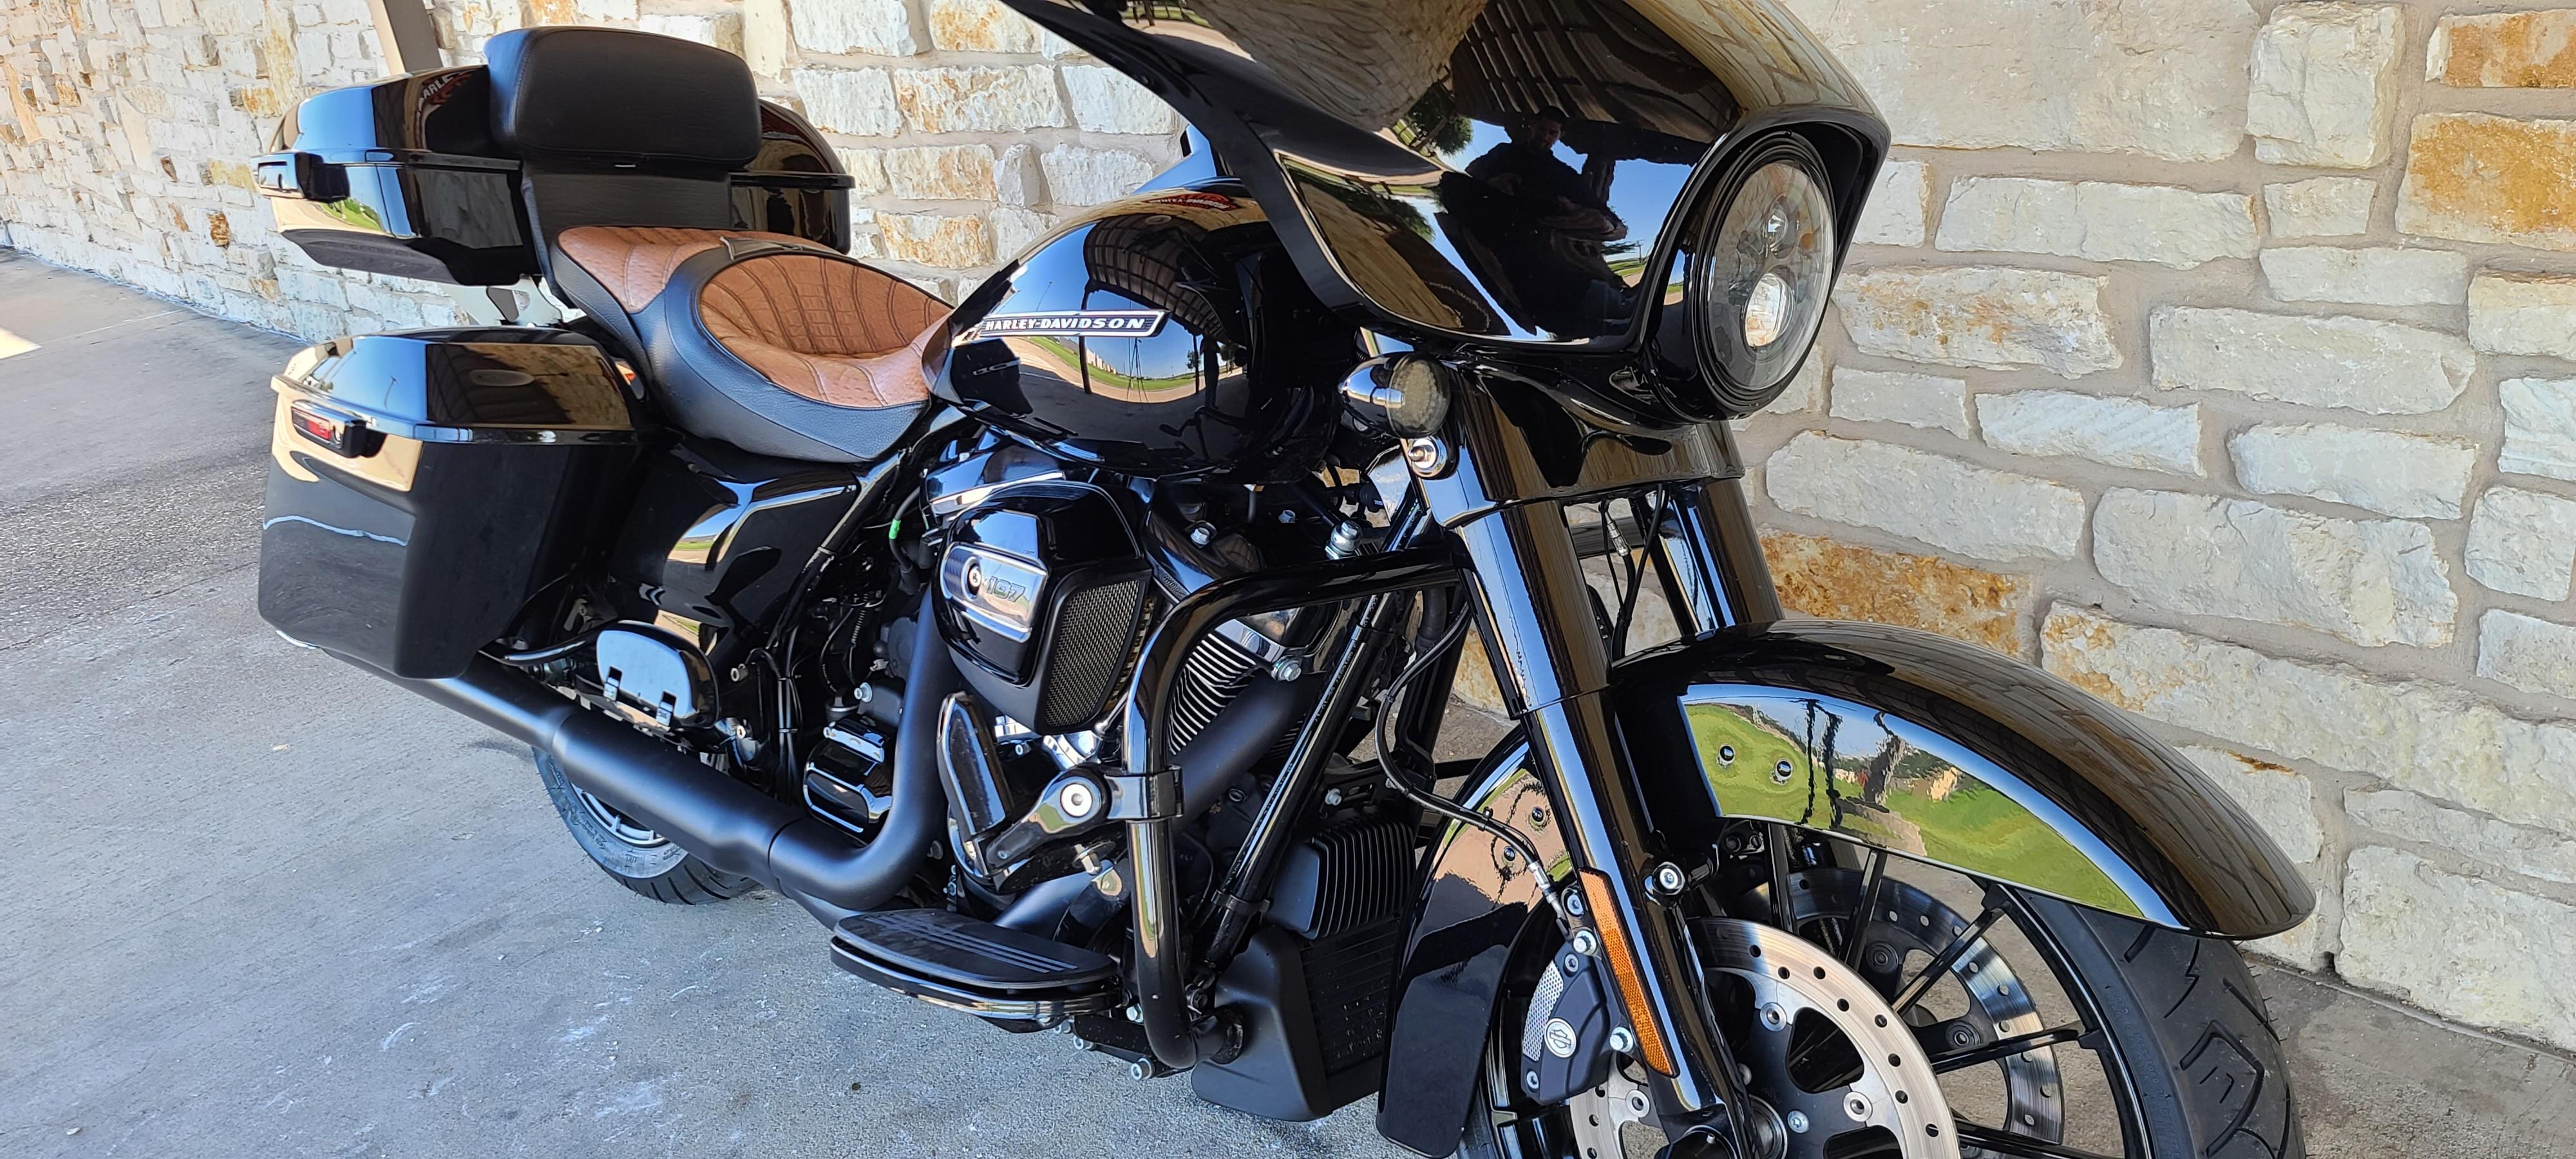 2018 Harley-Davidson Street Glide Special at Harley-Davidson of Waco